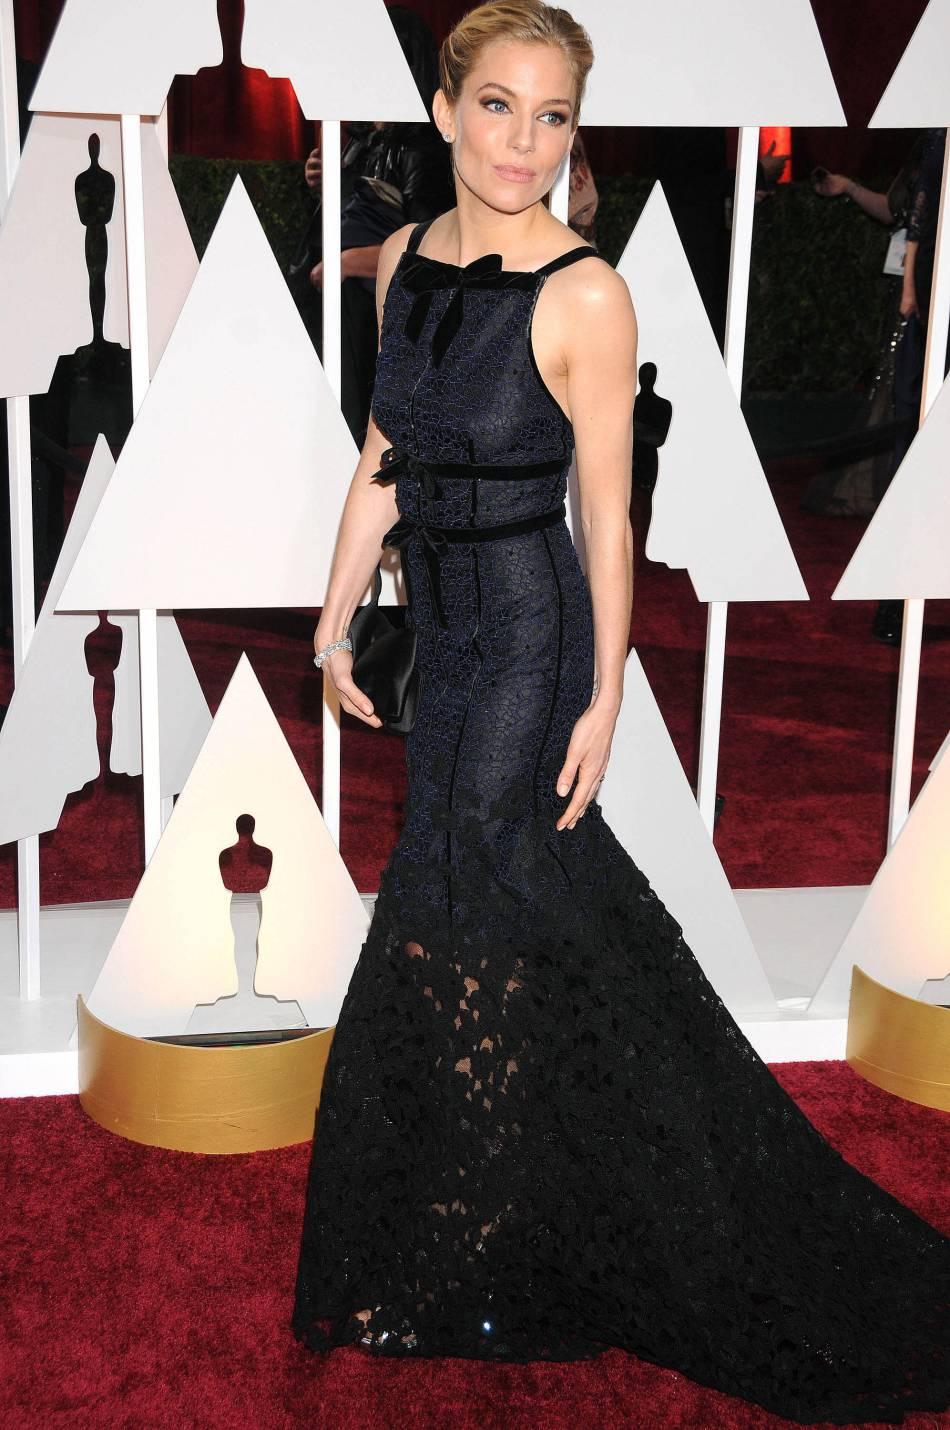 6bcf5482ed7 Sienna Miller joue la carte du chic absolu avec cette robe Oscar de la  Renta mariant